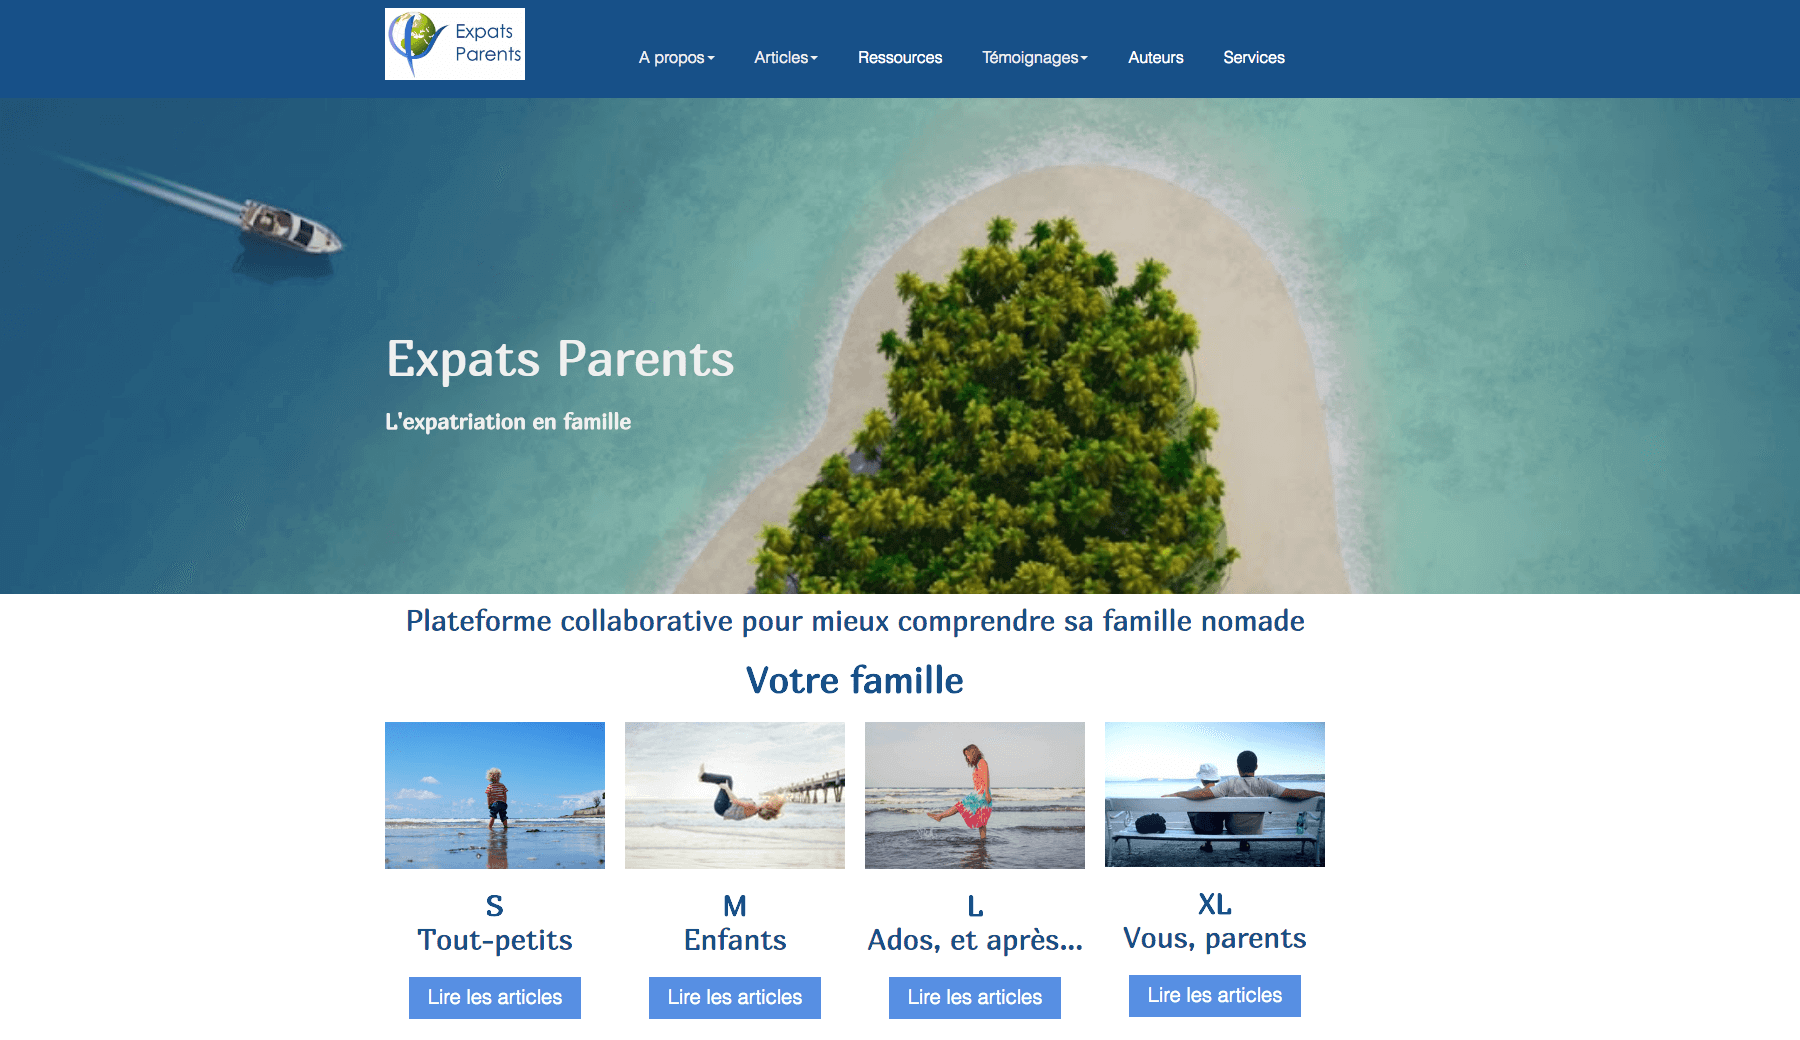 Expats Parents